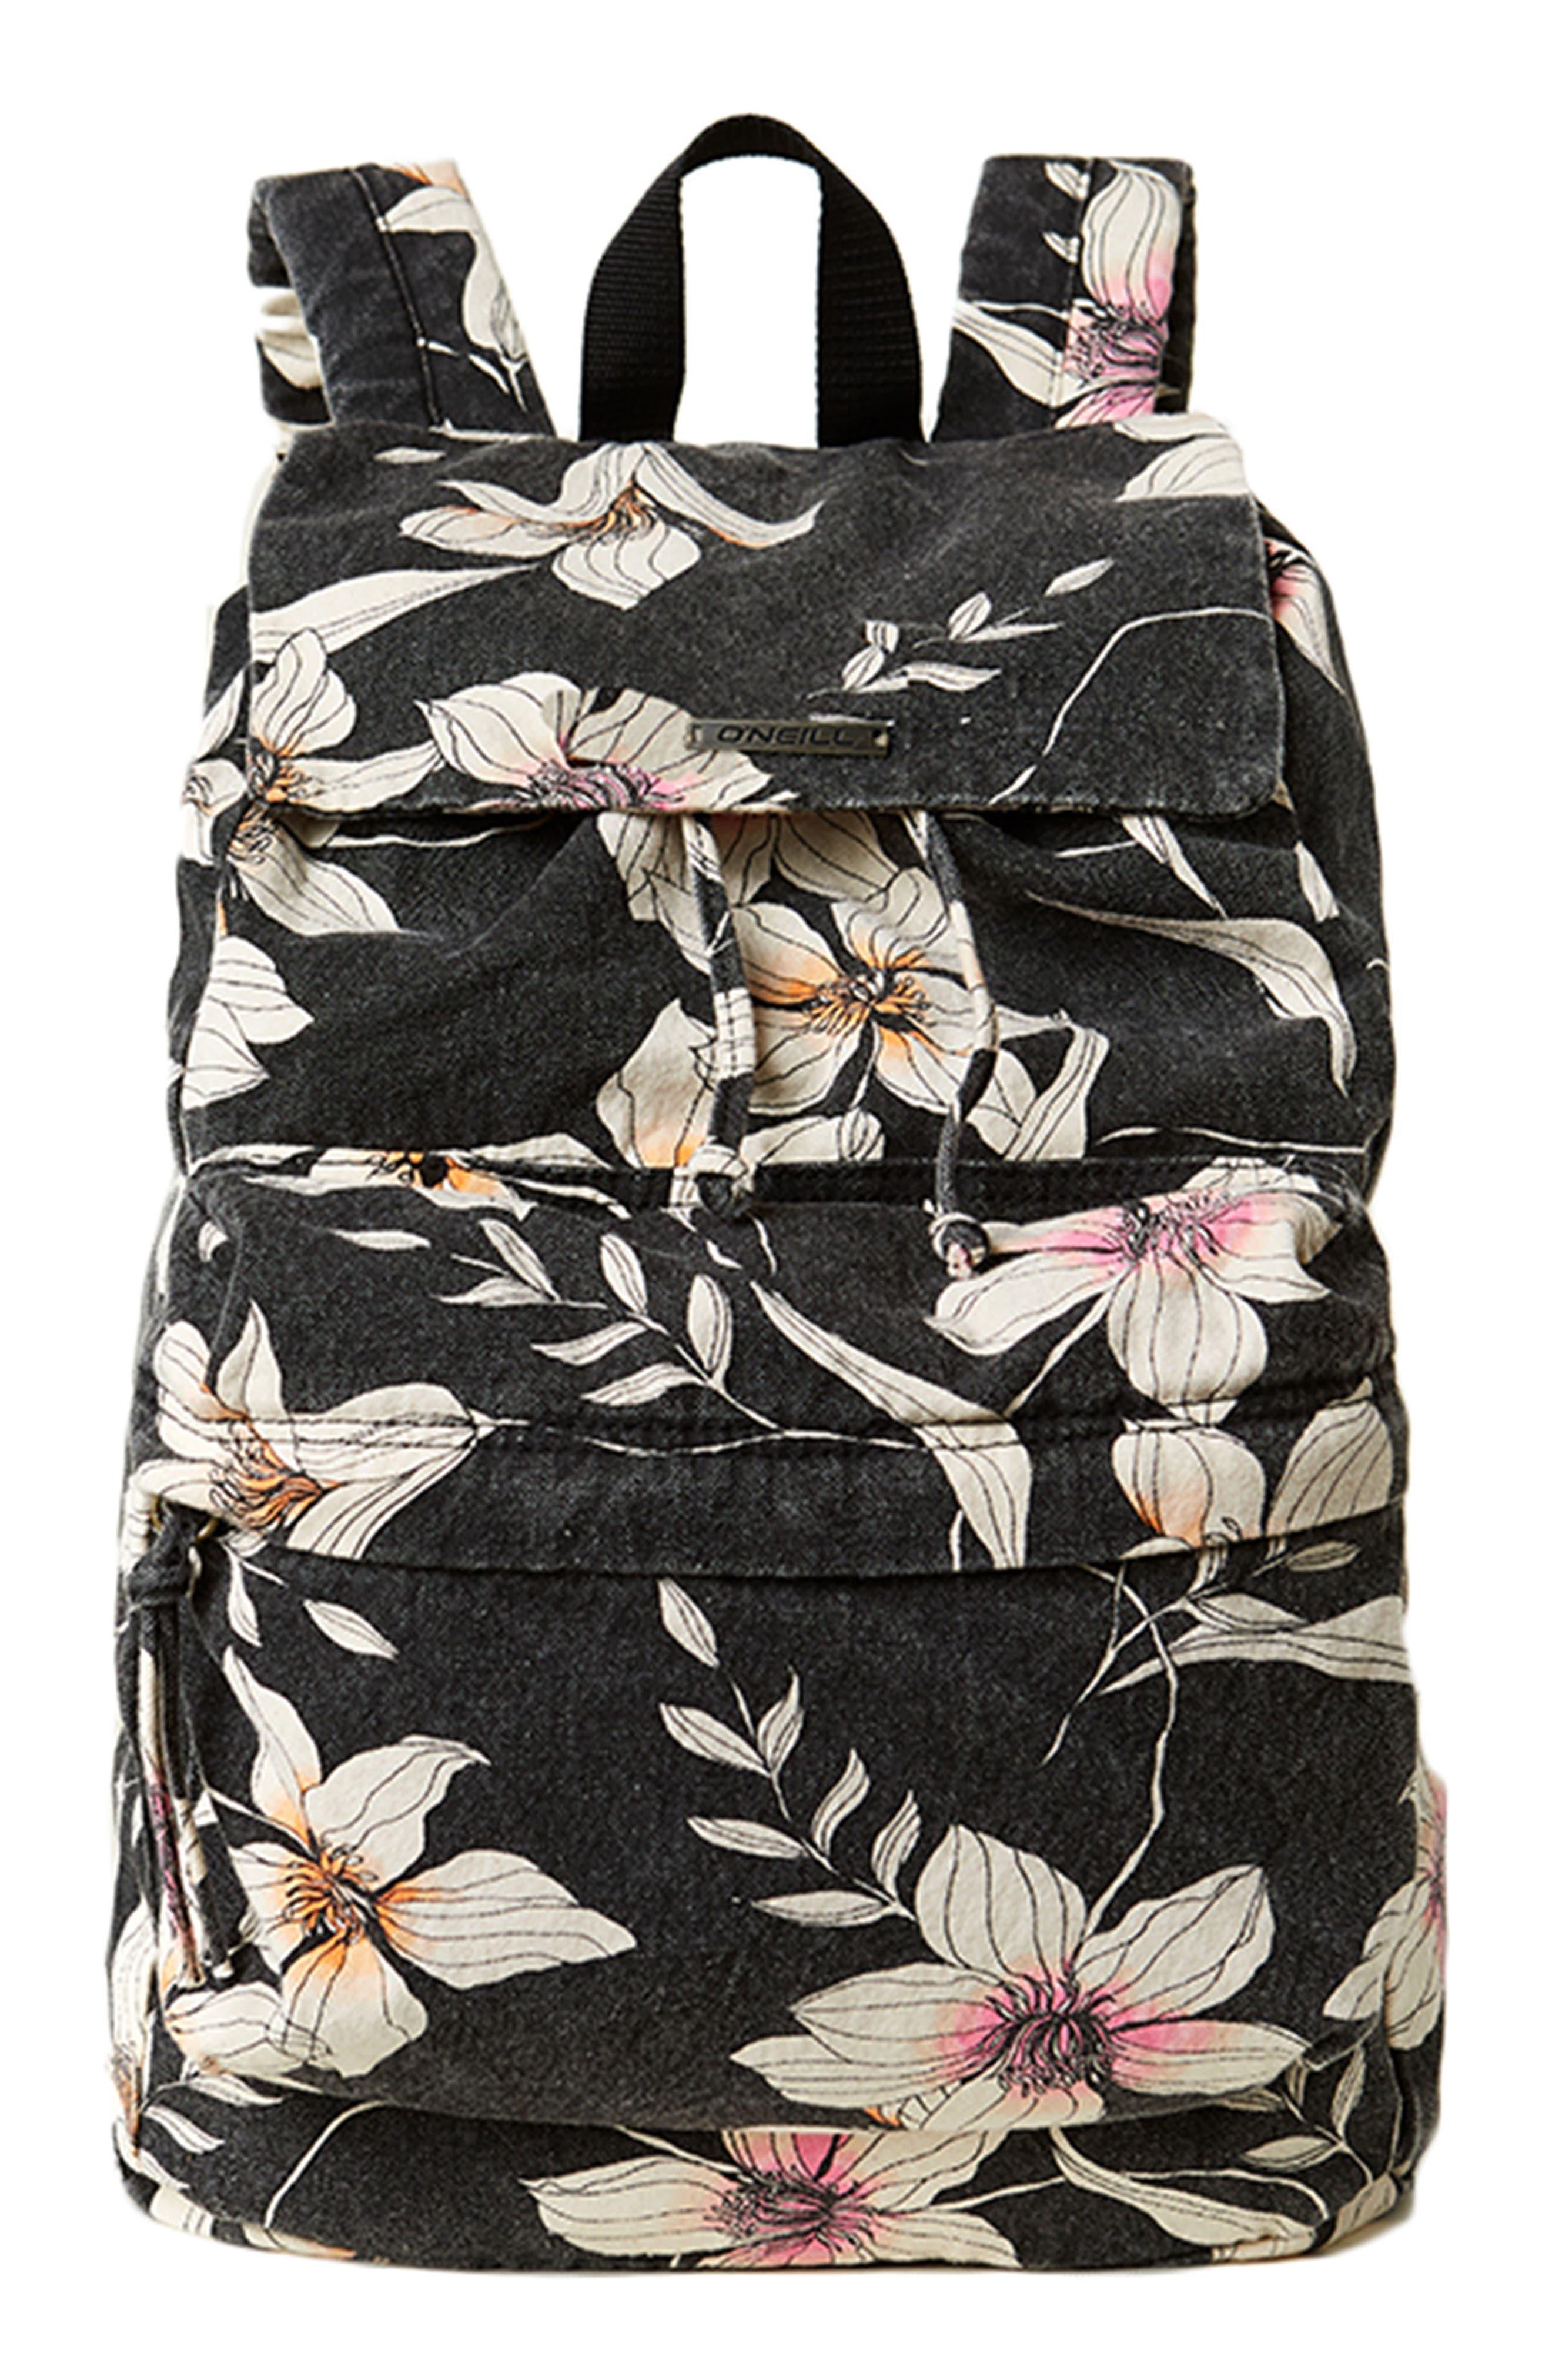 Starboard Floral Print Canvas Backpack,                         Main,                         color, Black